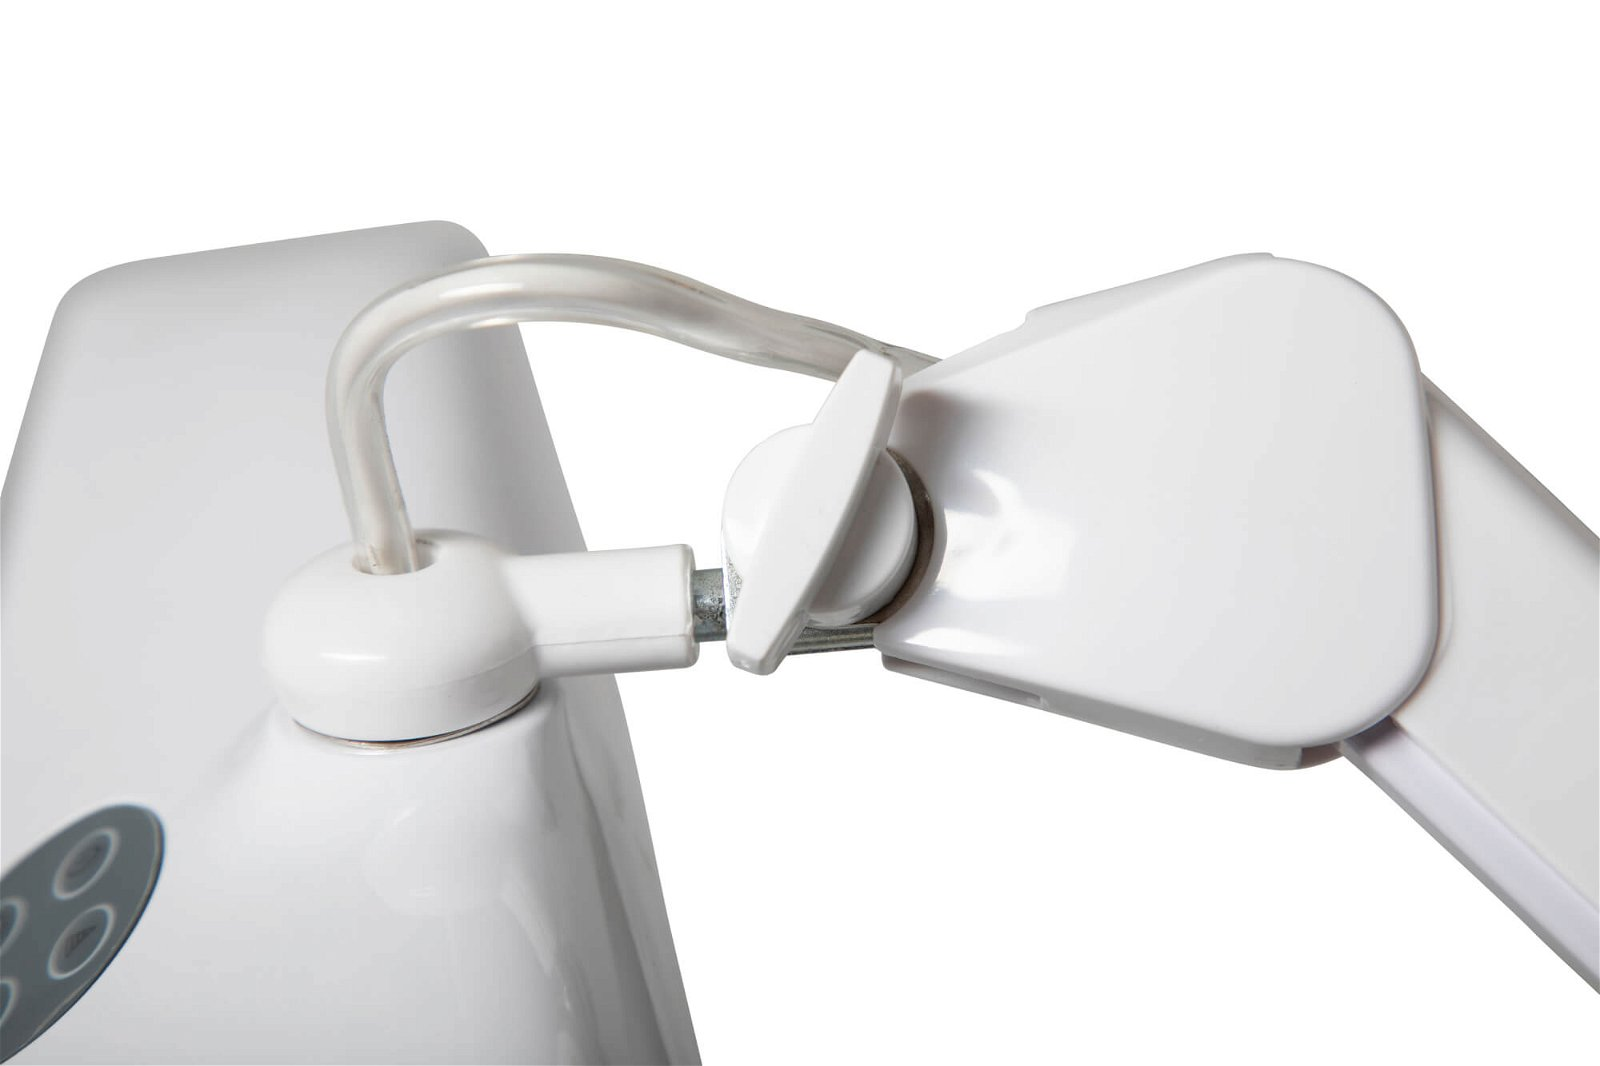 LED-Tischleuchte MAULwork, dimmbar